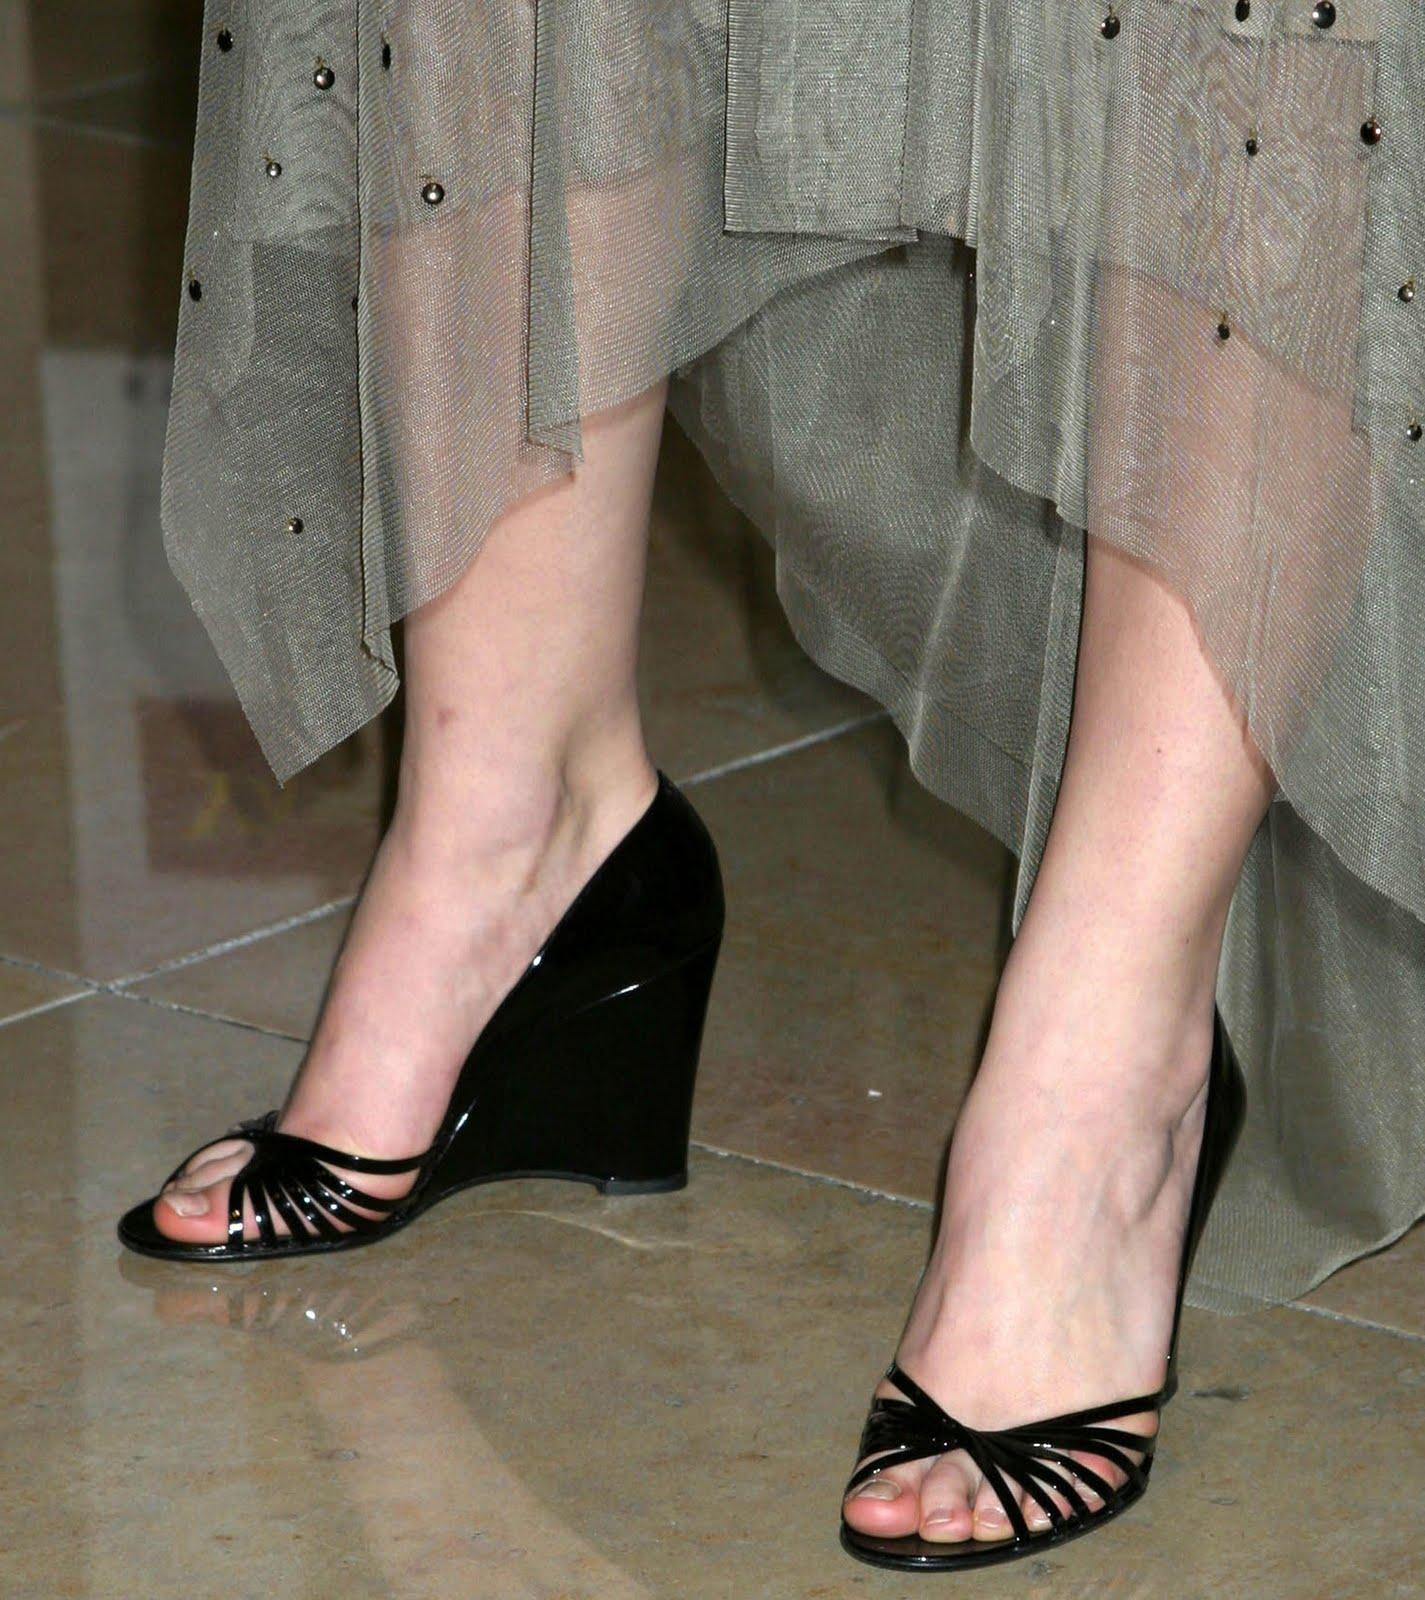 http://2.bp.blogspot.com/_UaLWp72nij4/S-m97Ssh8fI/AAAAAAAAKoQ/qioYjo5ZEls/s1600/keira-knightley-feet-2.jpg